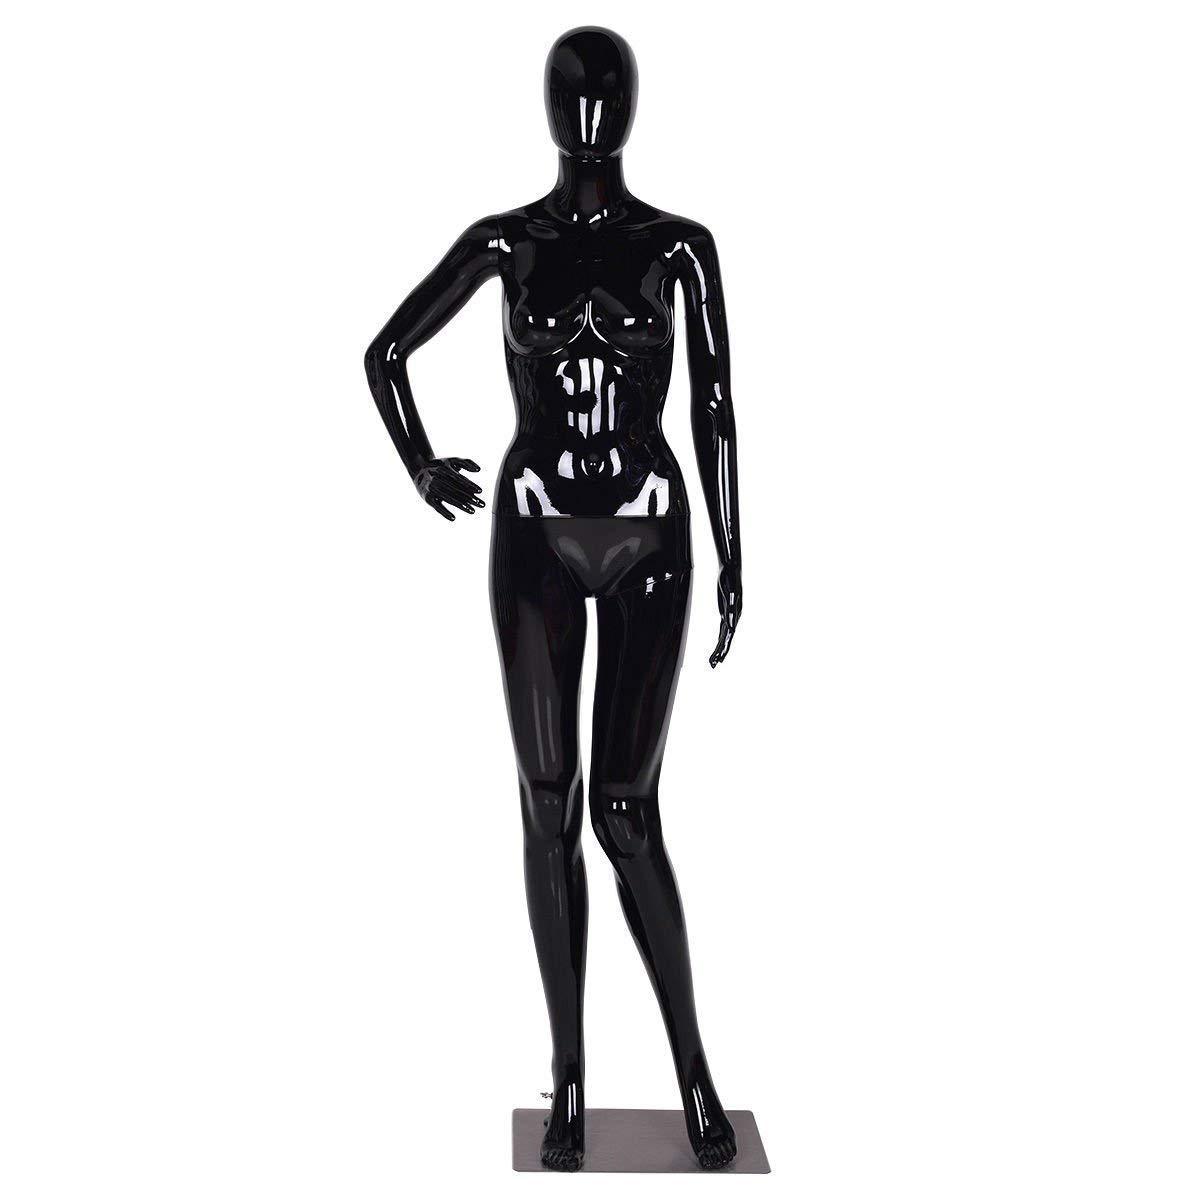 Female Mannequin Full Body Dress Form Display Plastic Egghead High Gloss Black